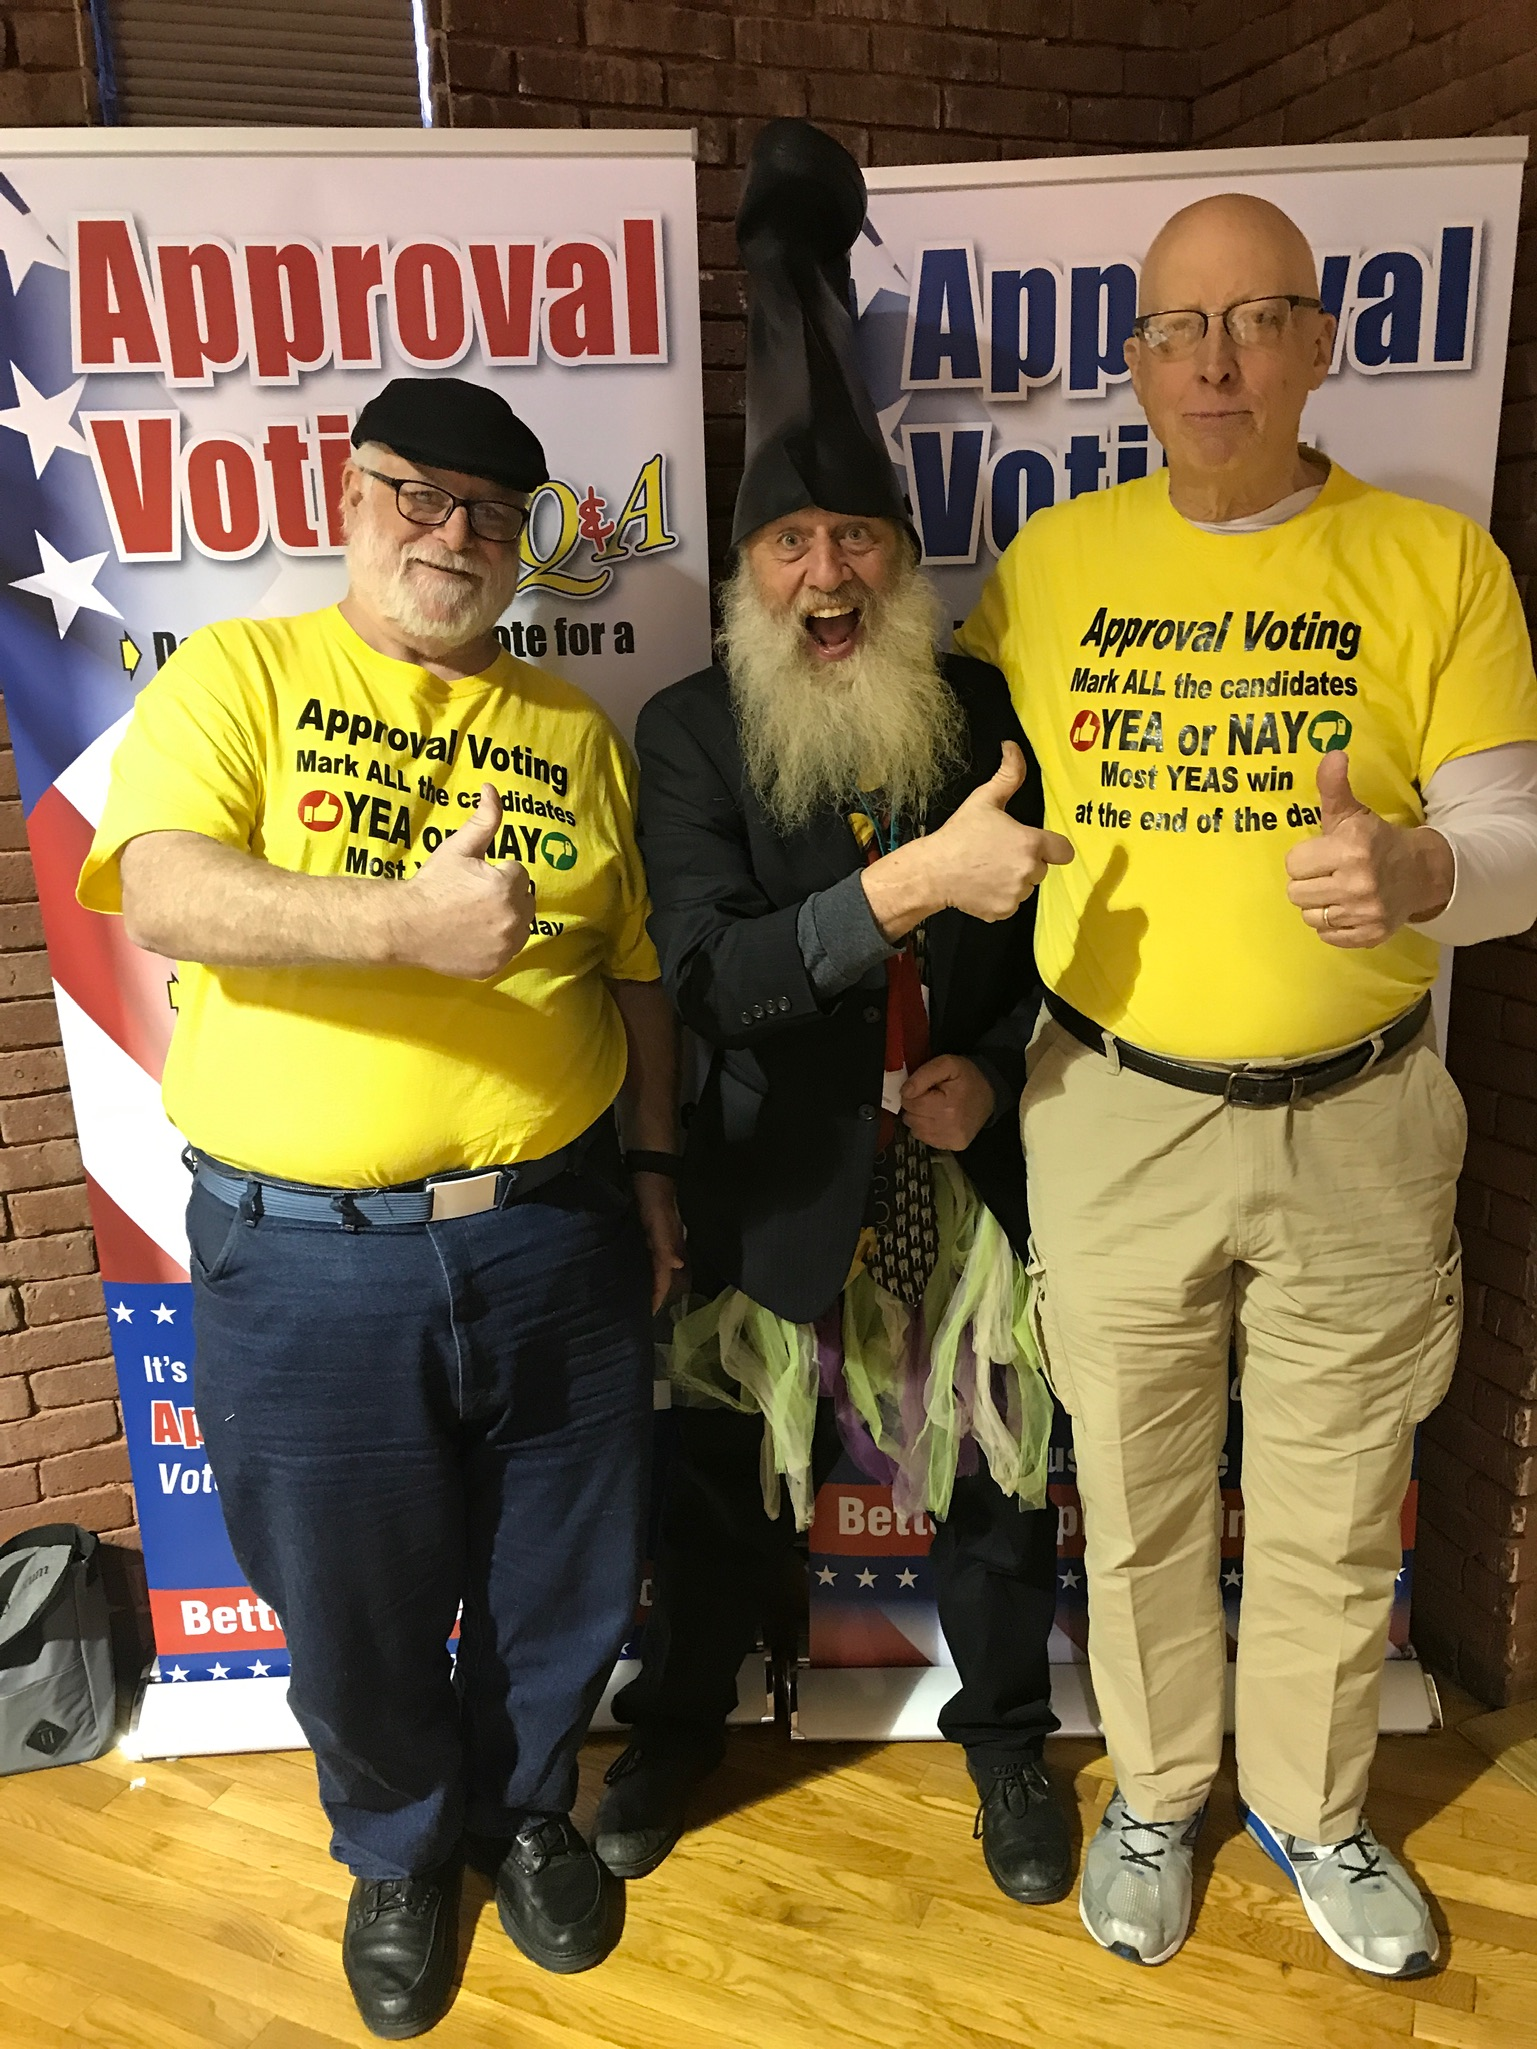 UTV/AV at New Hampshire Liberty Forum 2019